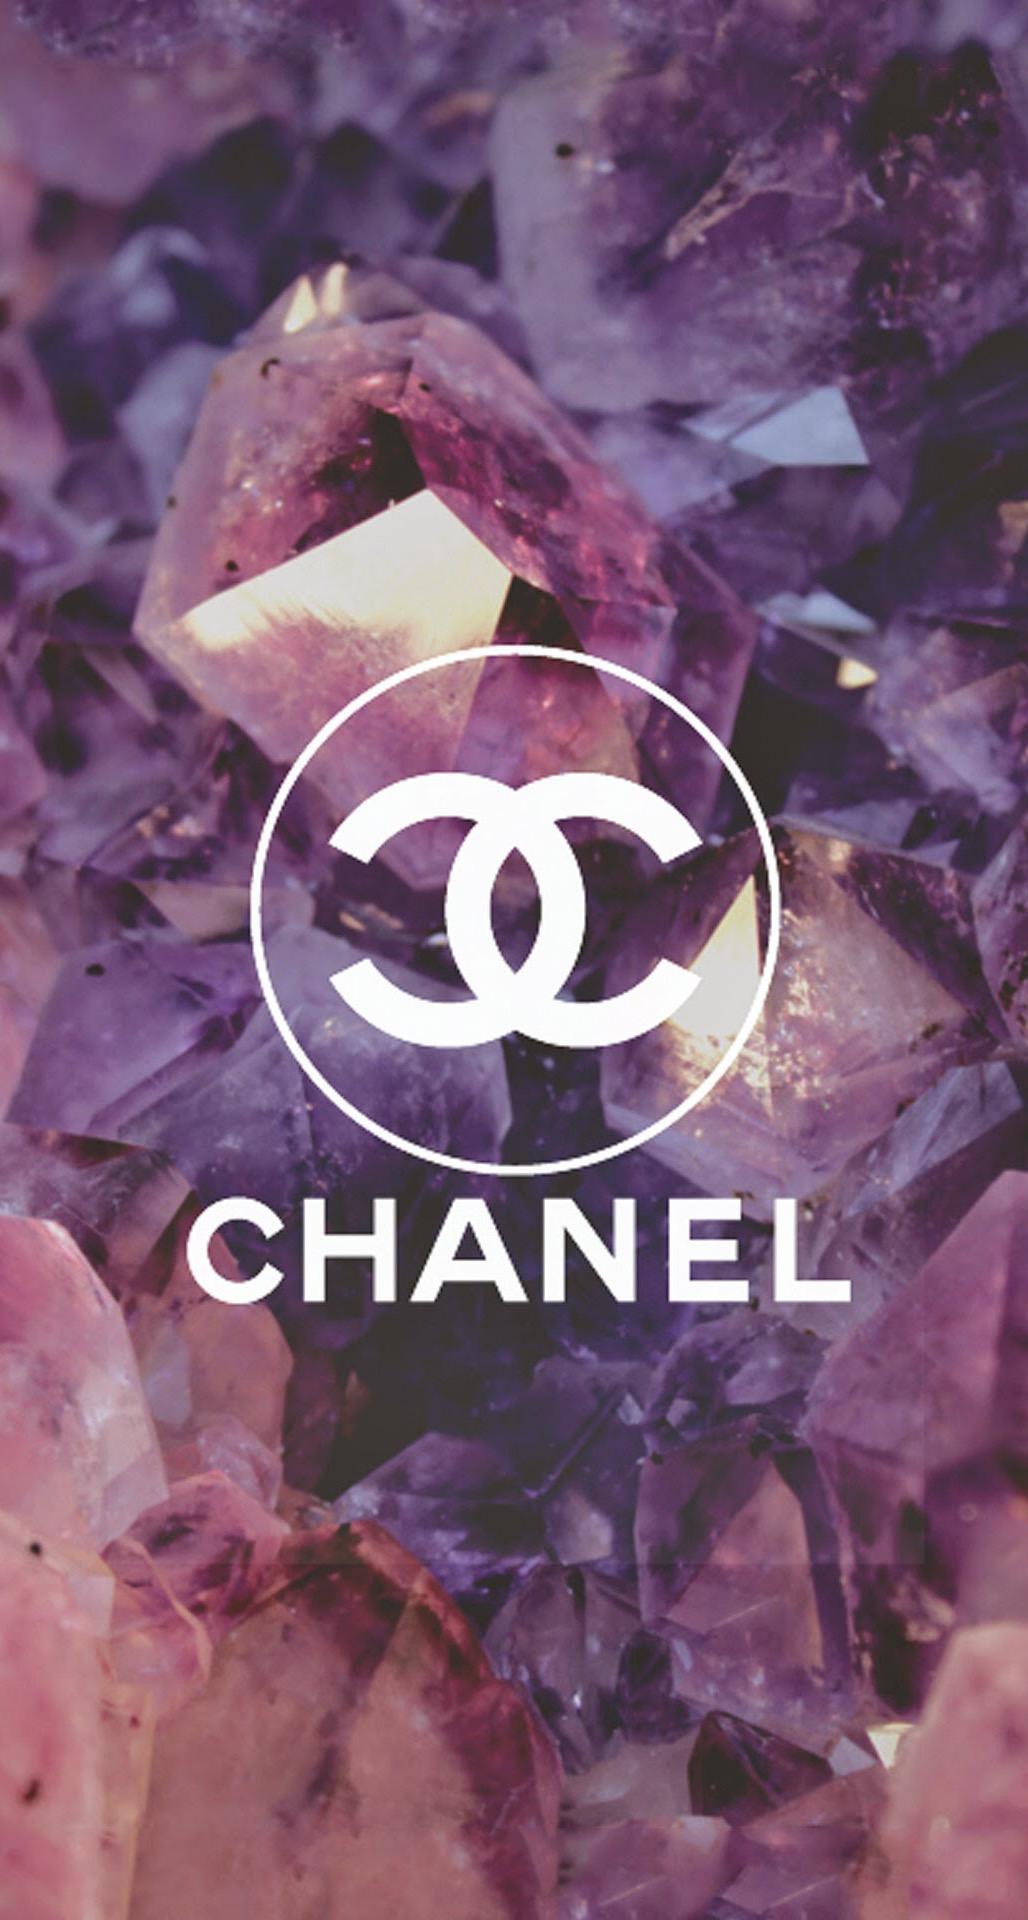 48 Coco Chanel Iphone Wallpaper On Wallpapersafari